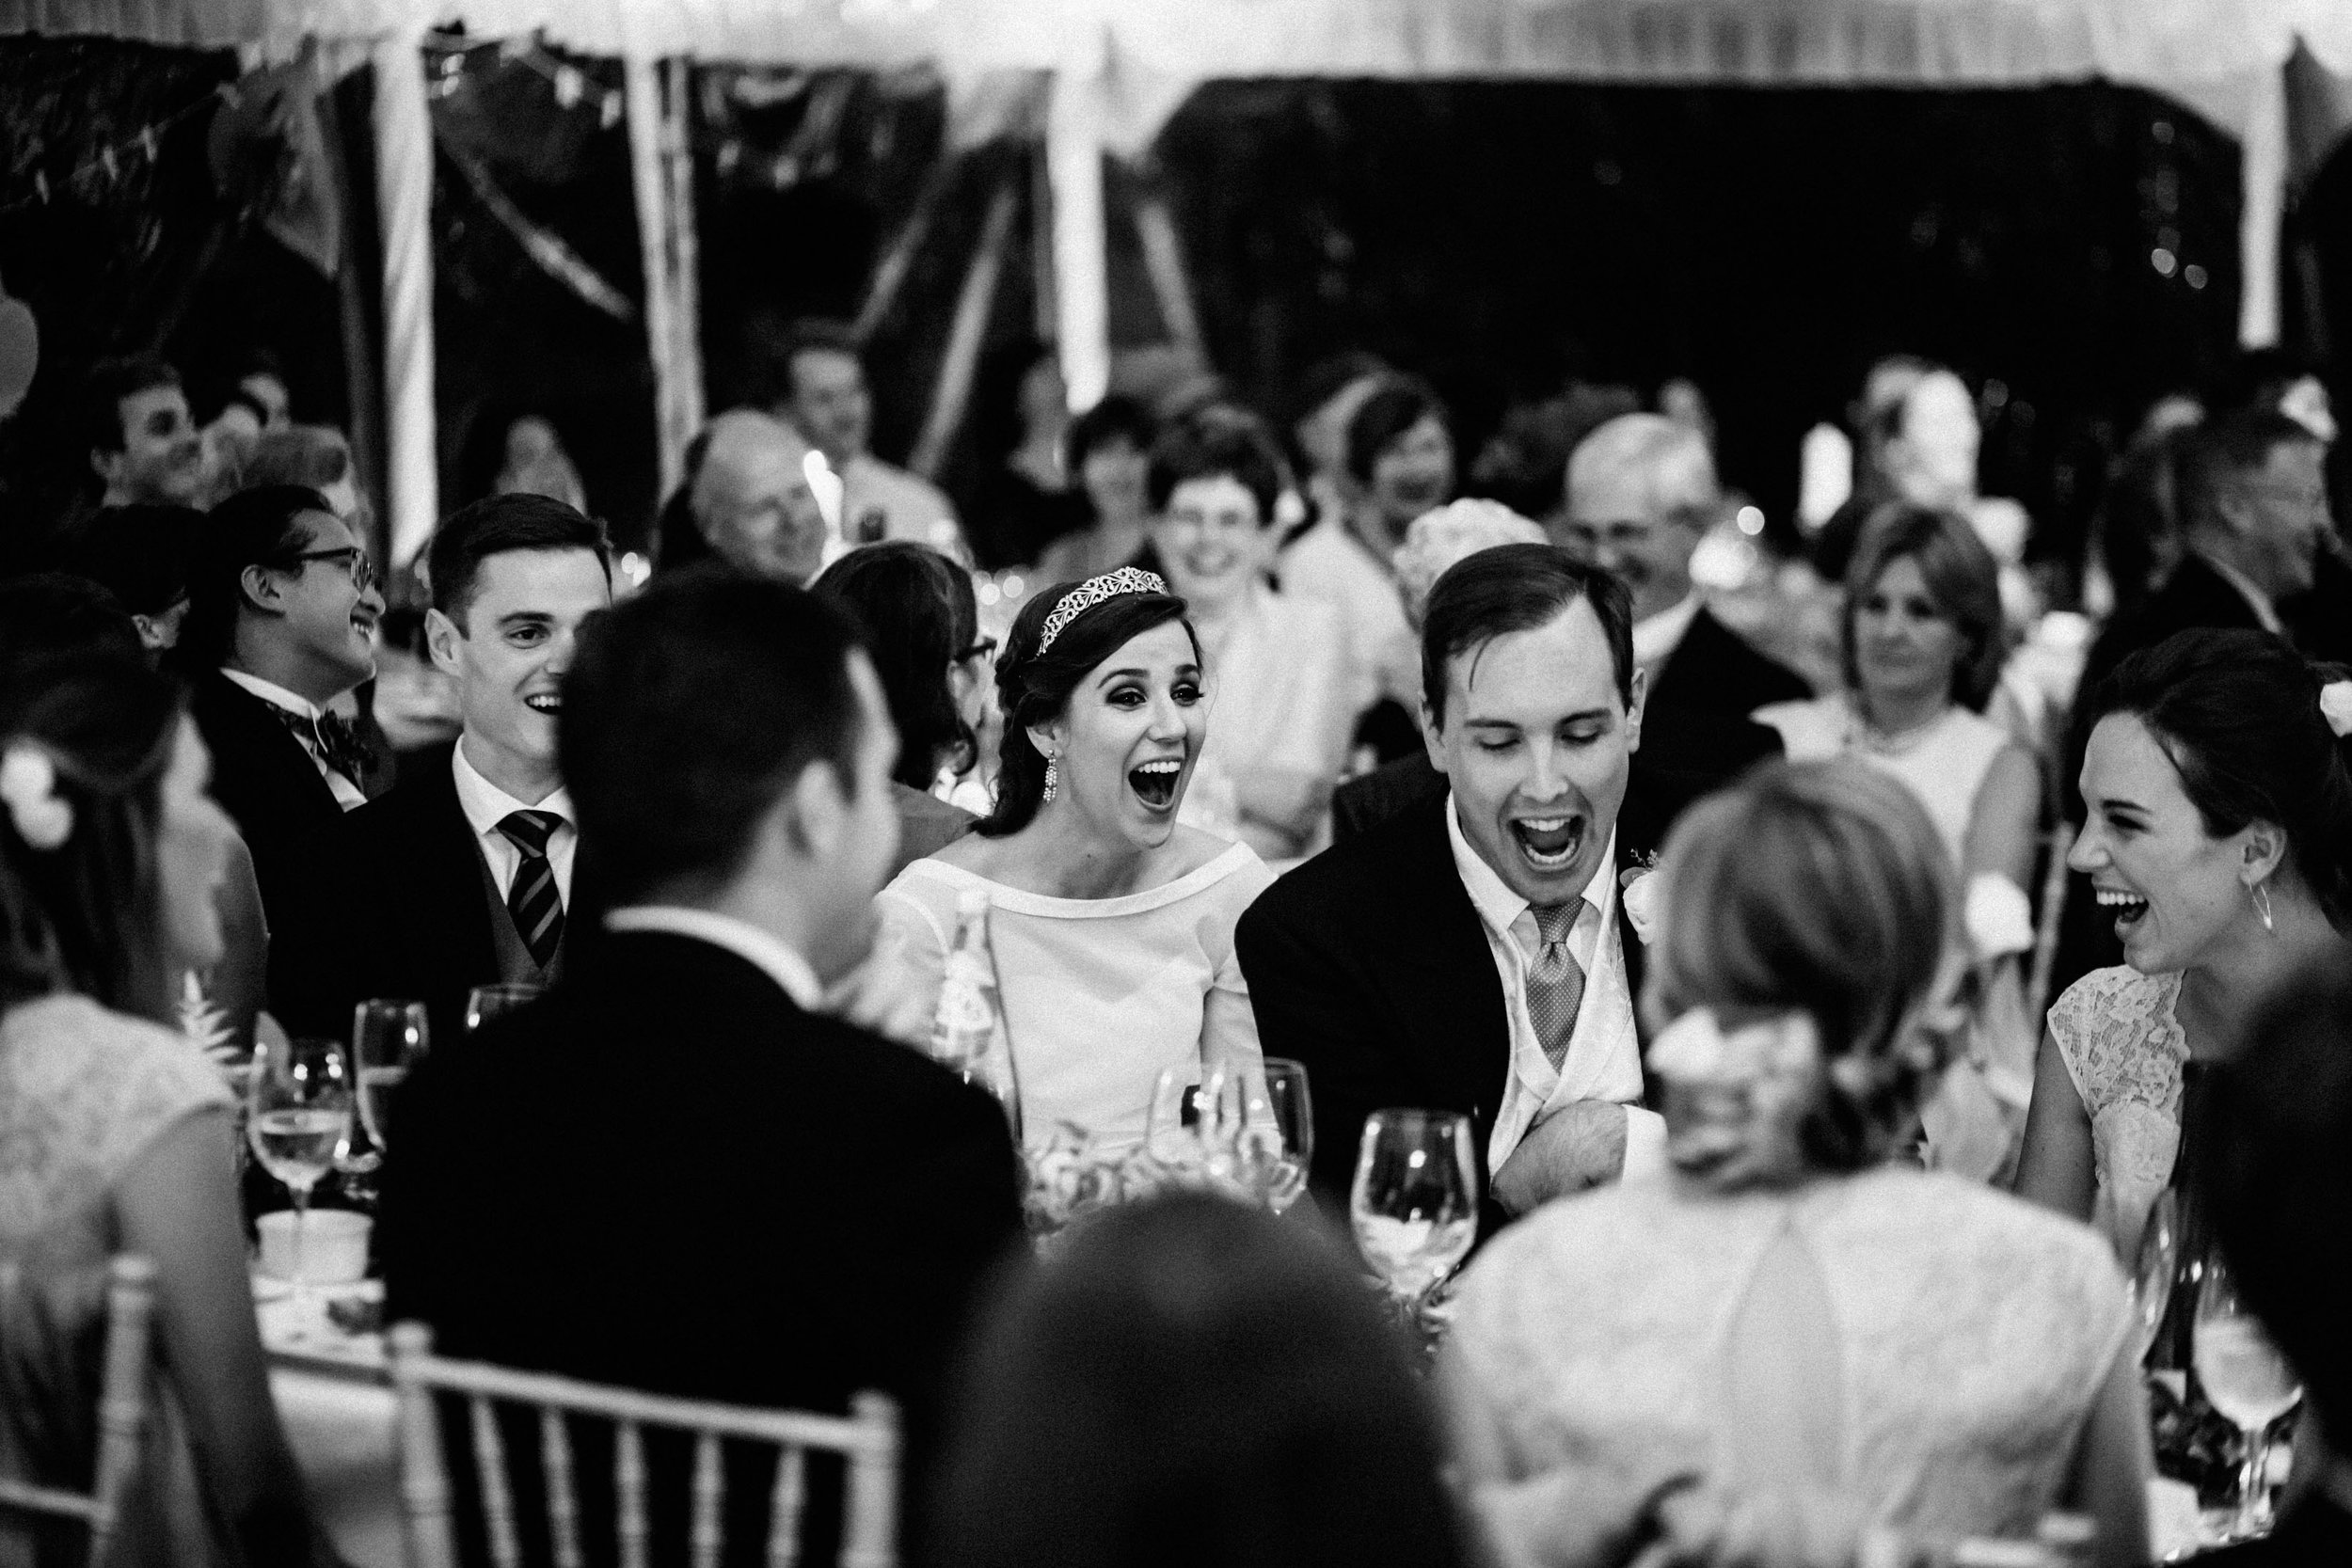 oxford_wedding_photographer-109.jpg